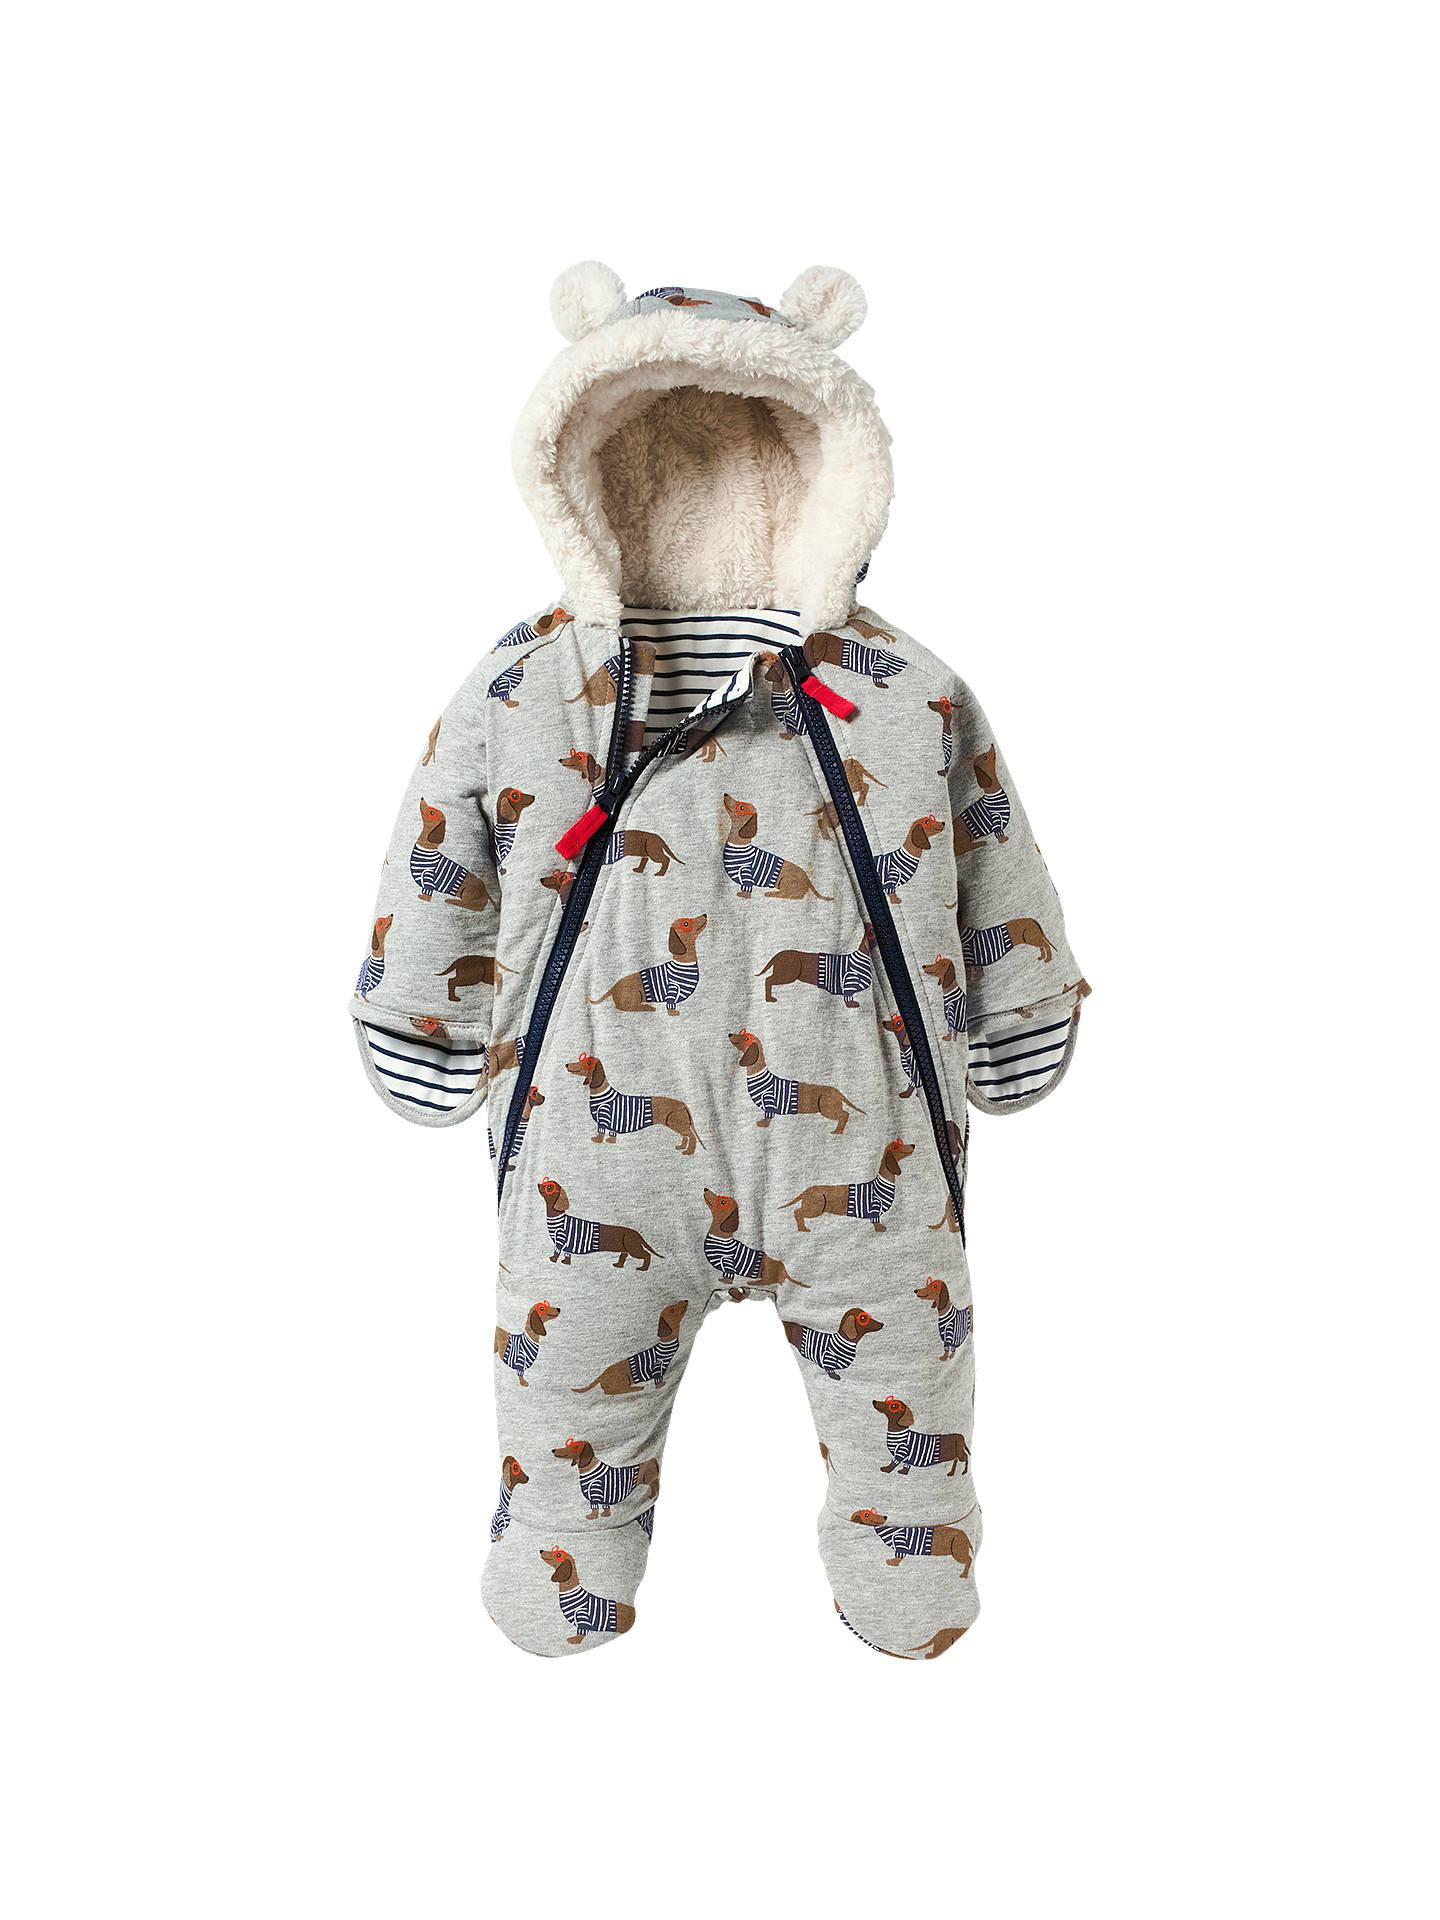 9dadd0d97 Buy Mini Boden Baby Dachshund Print Snowsuit, Grey/Multi, 0-3 months ...